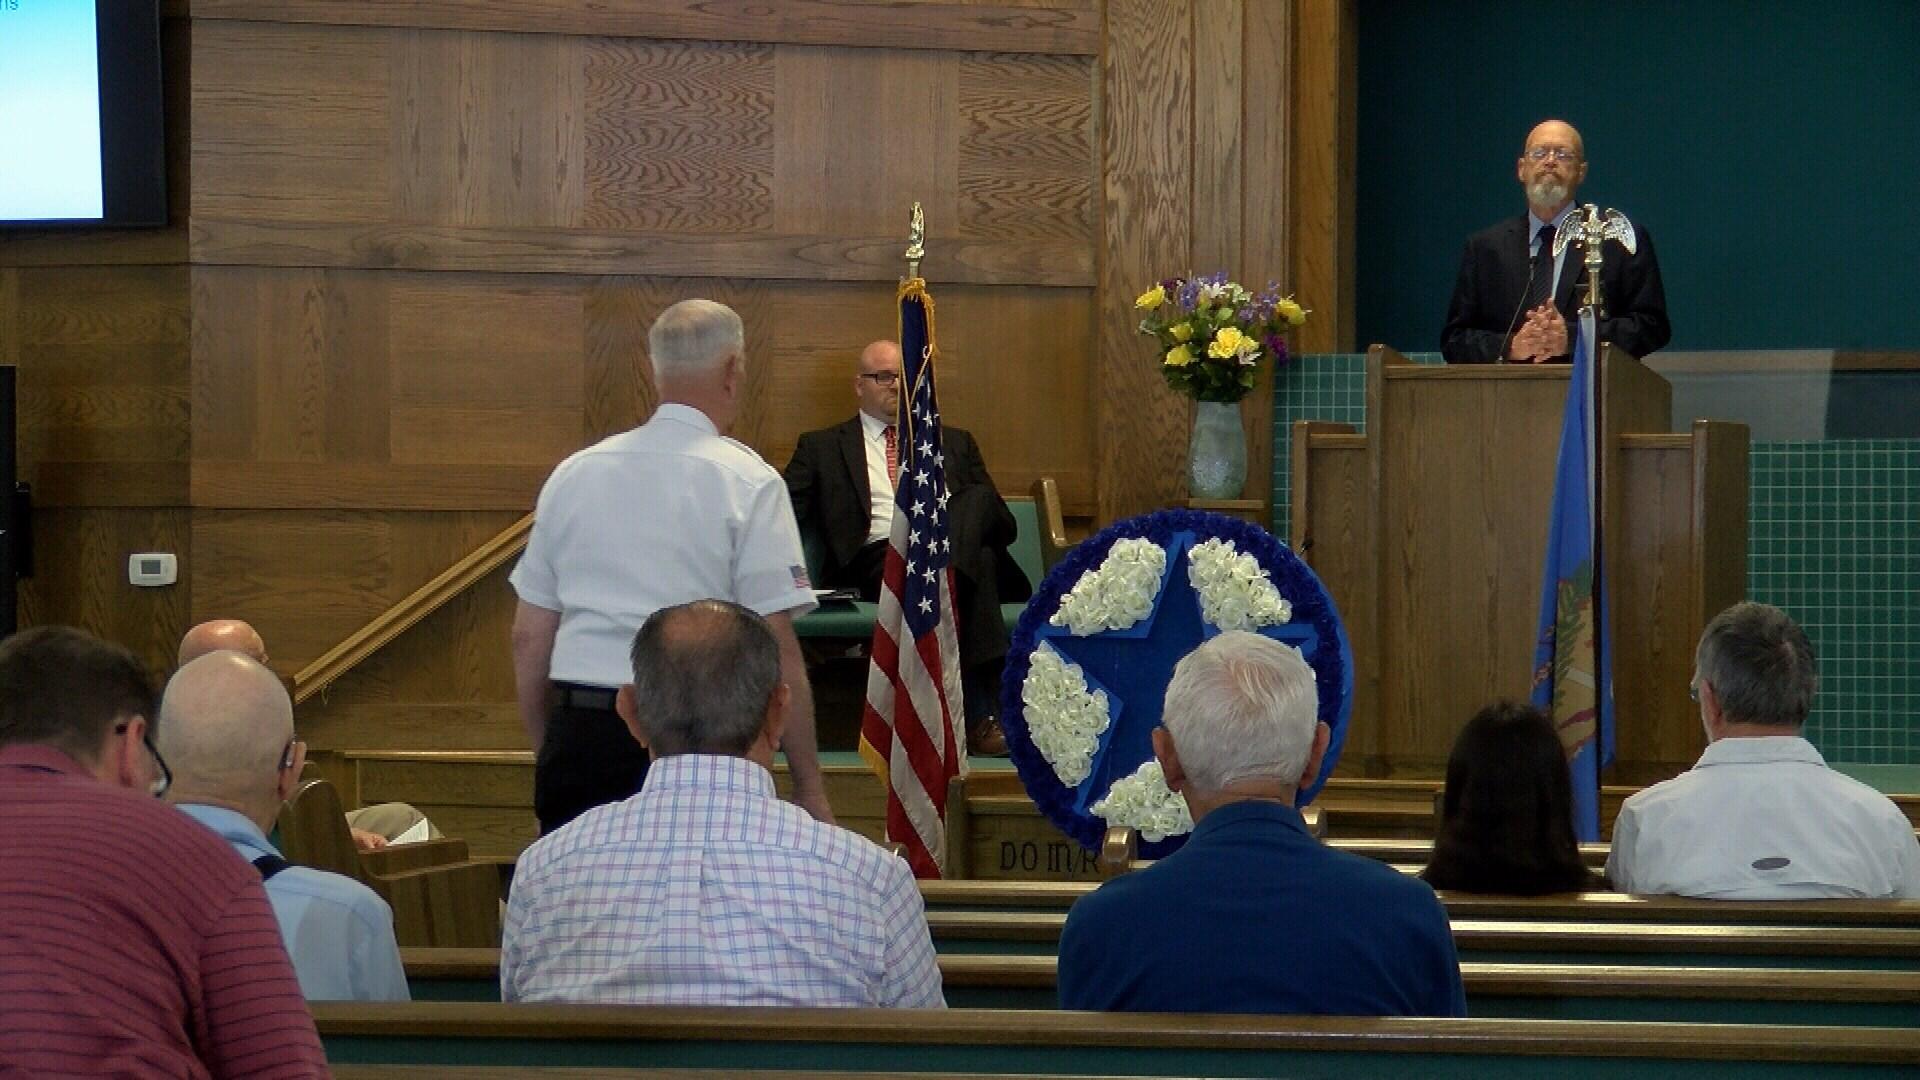 McAllen Police Honors Fallen Officers